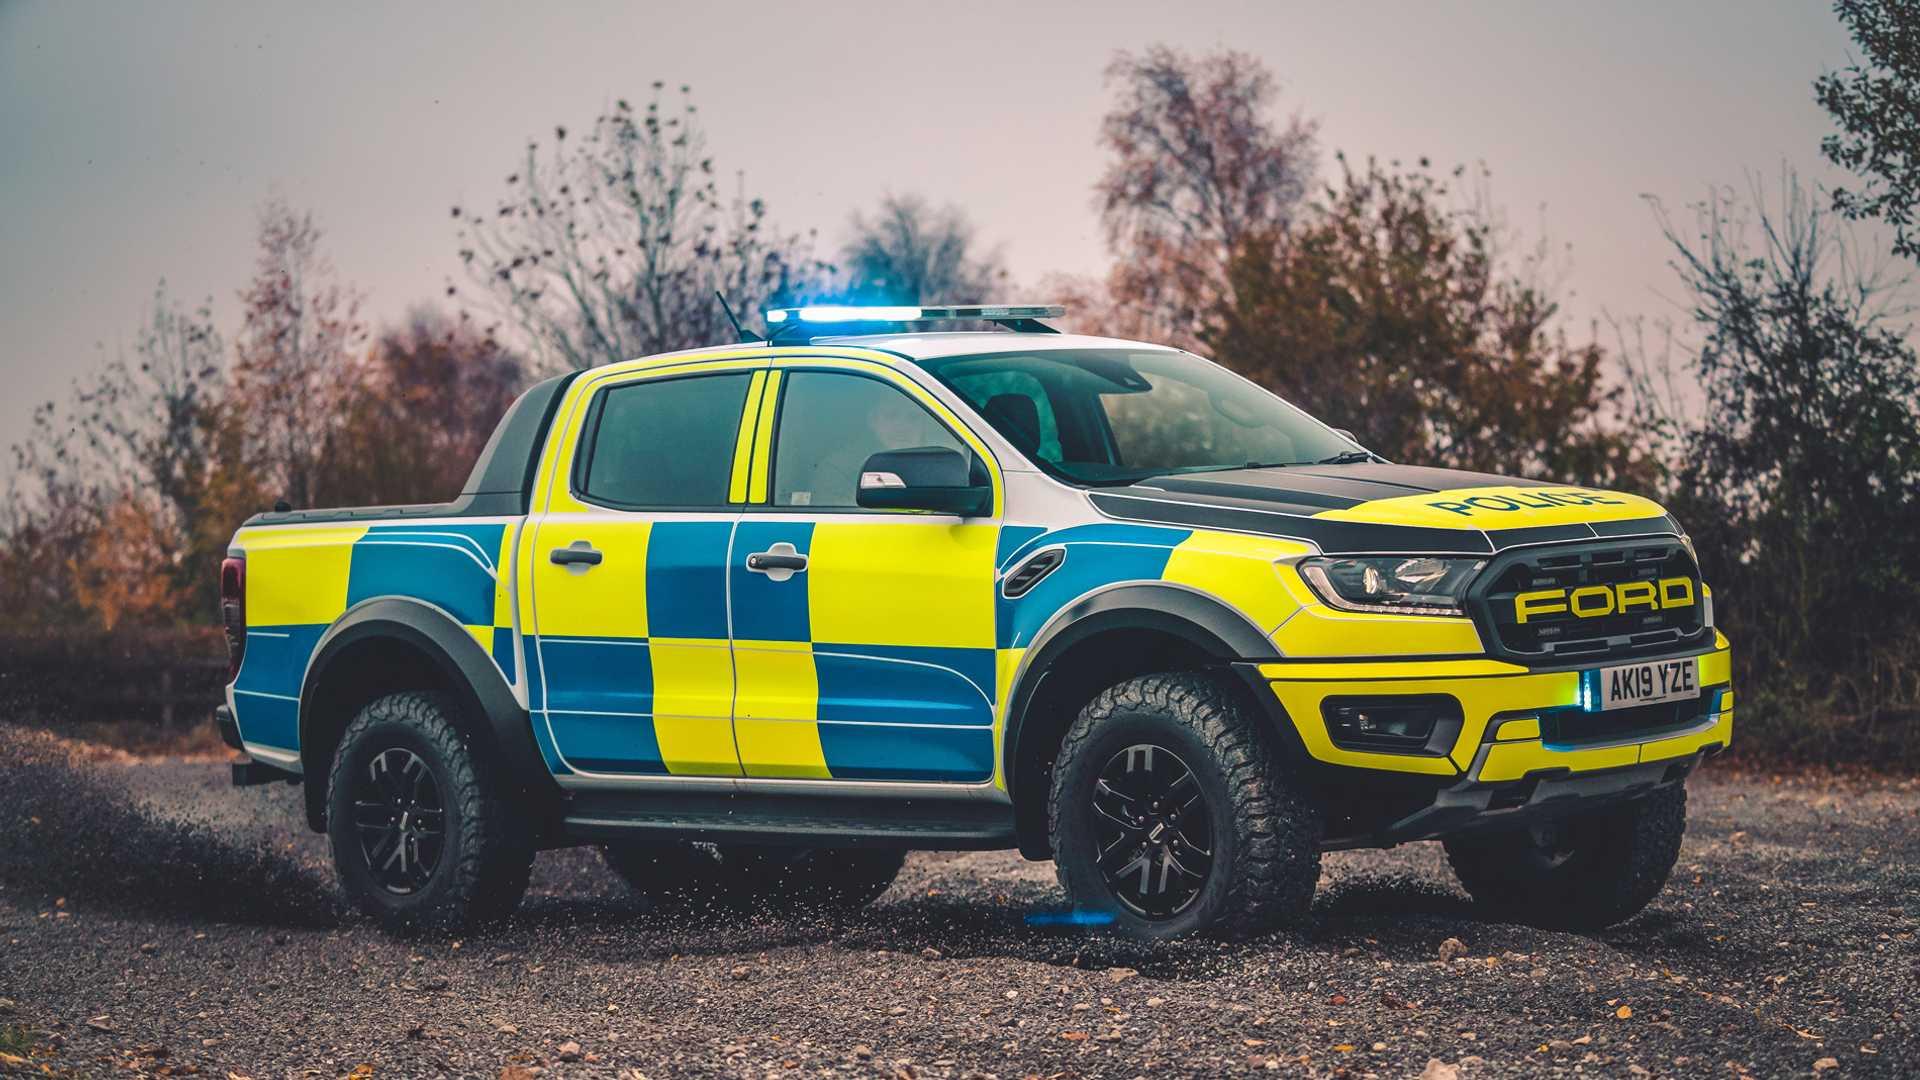 Ford-Focus-ST-and-Ranger-Raptor-UK-police-cars-15